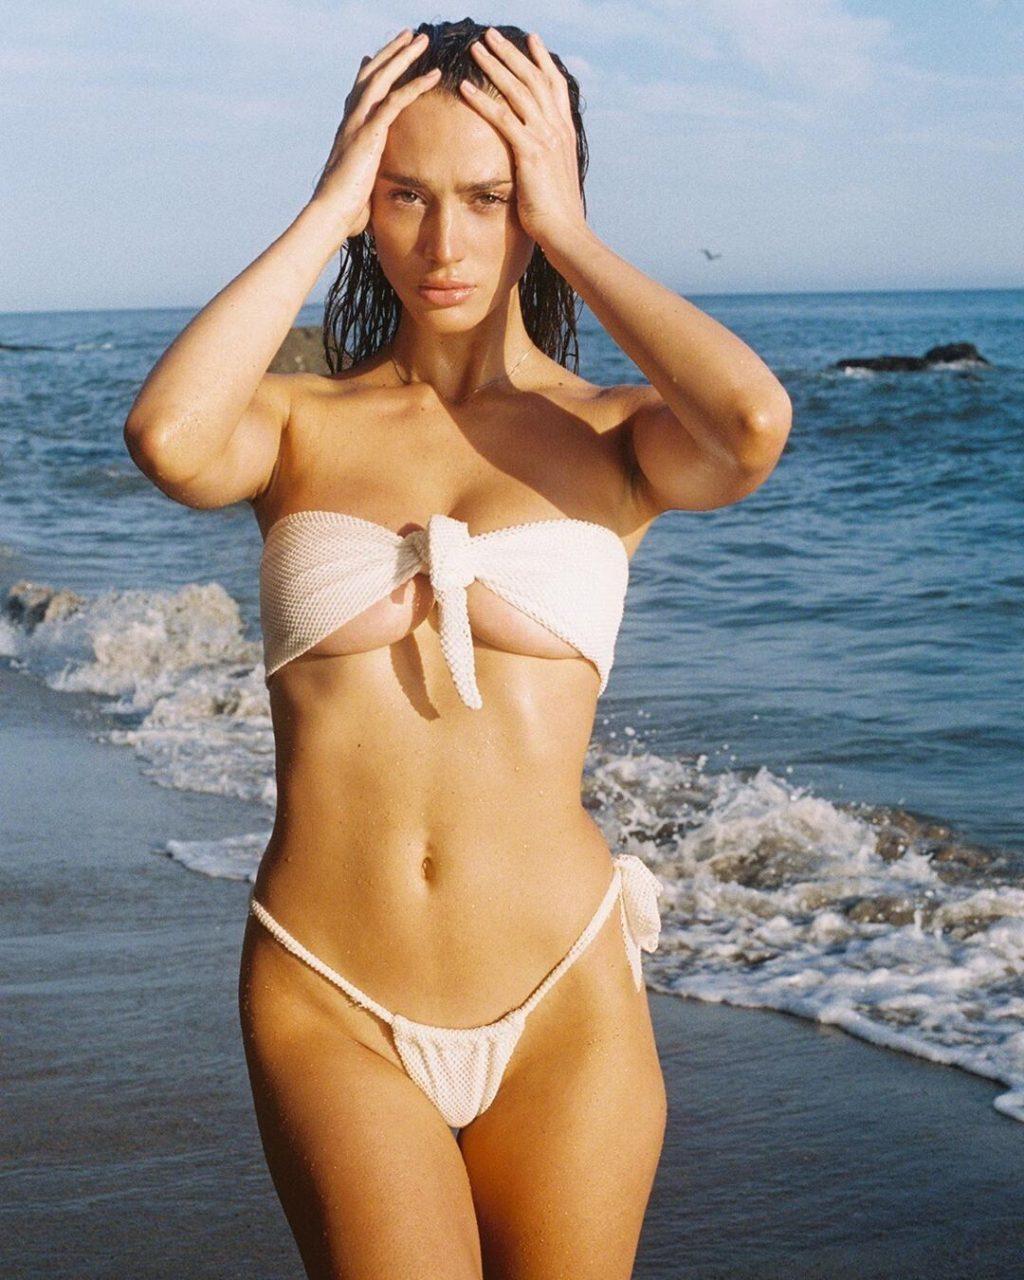 Jordyn Johnson Nude Sexy Thefappeningblog Com 79 1024x1280